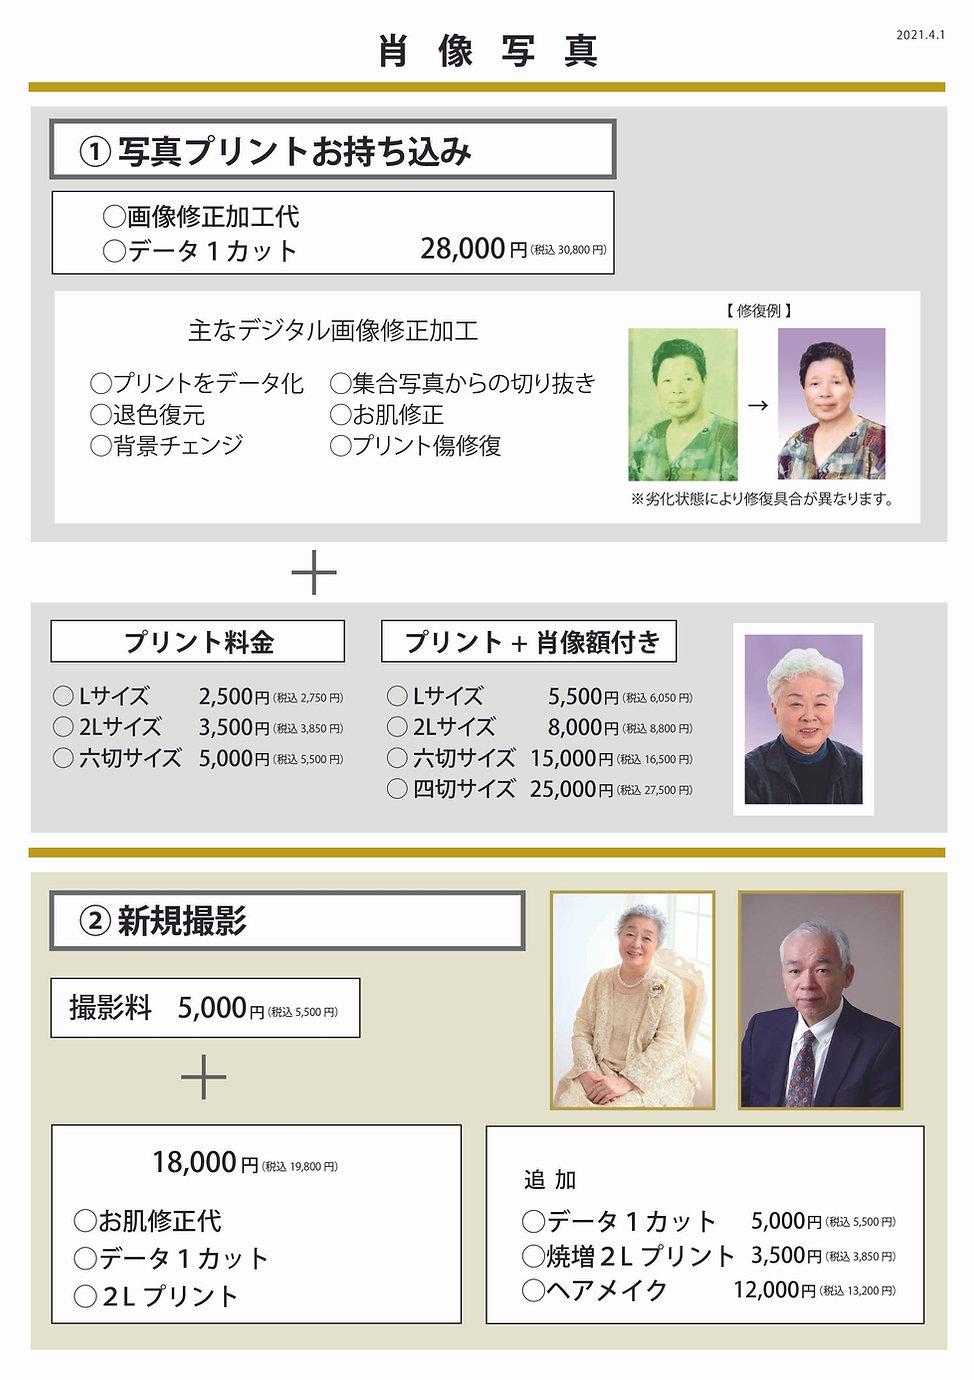 syozo_2021.jpg